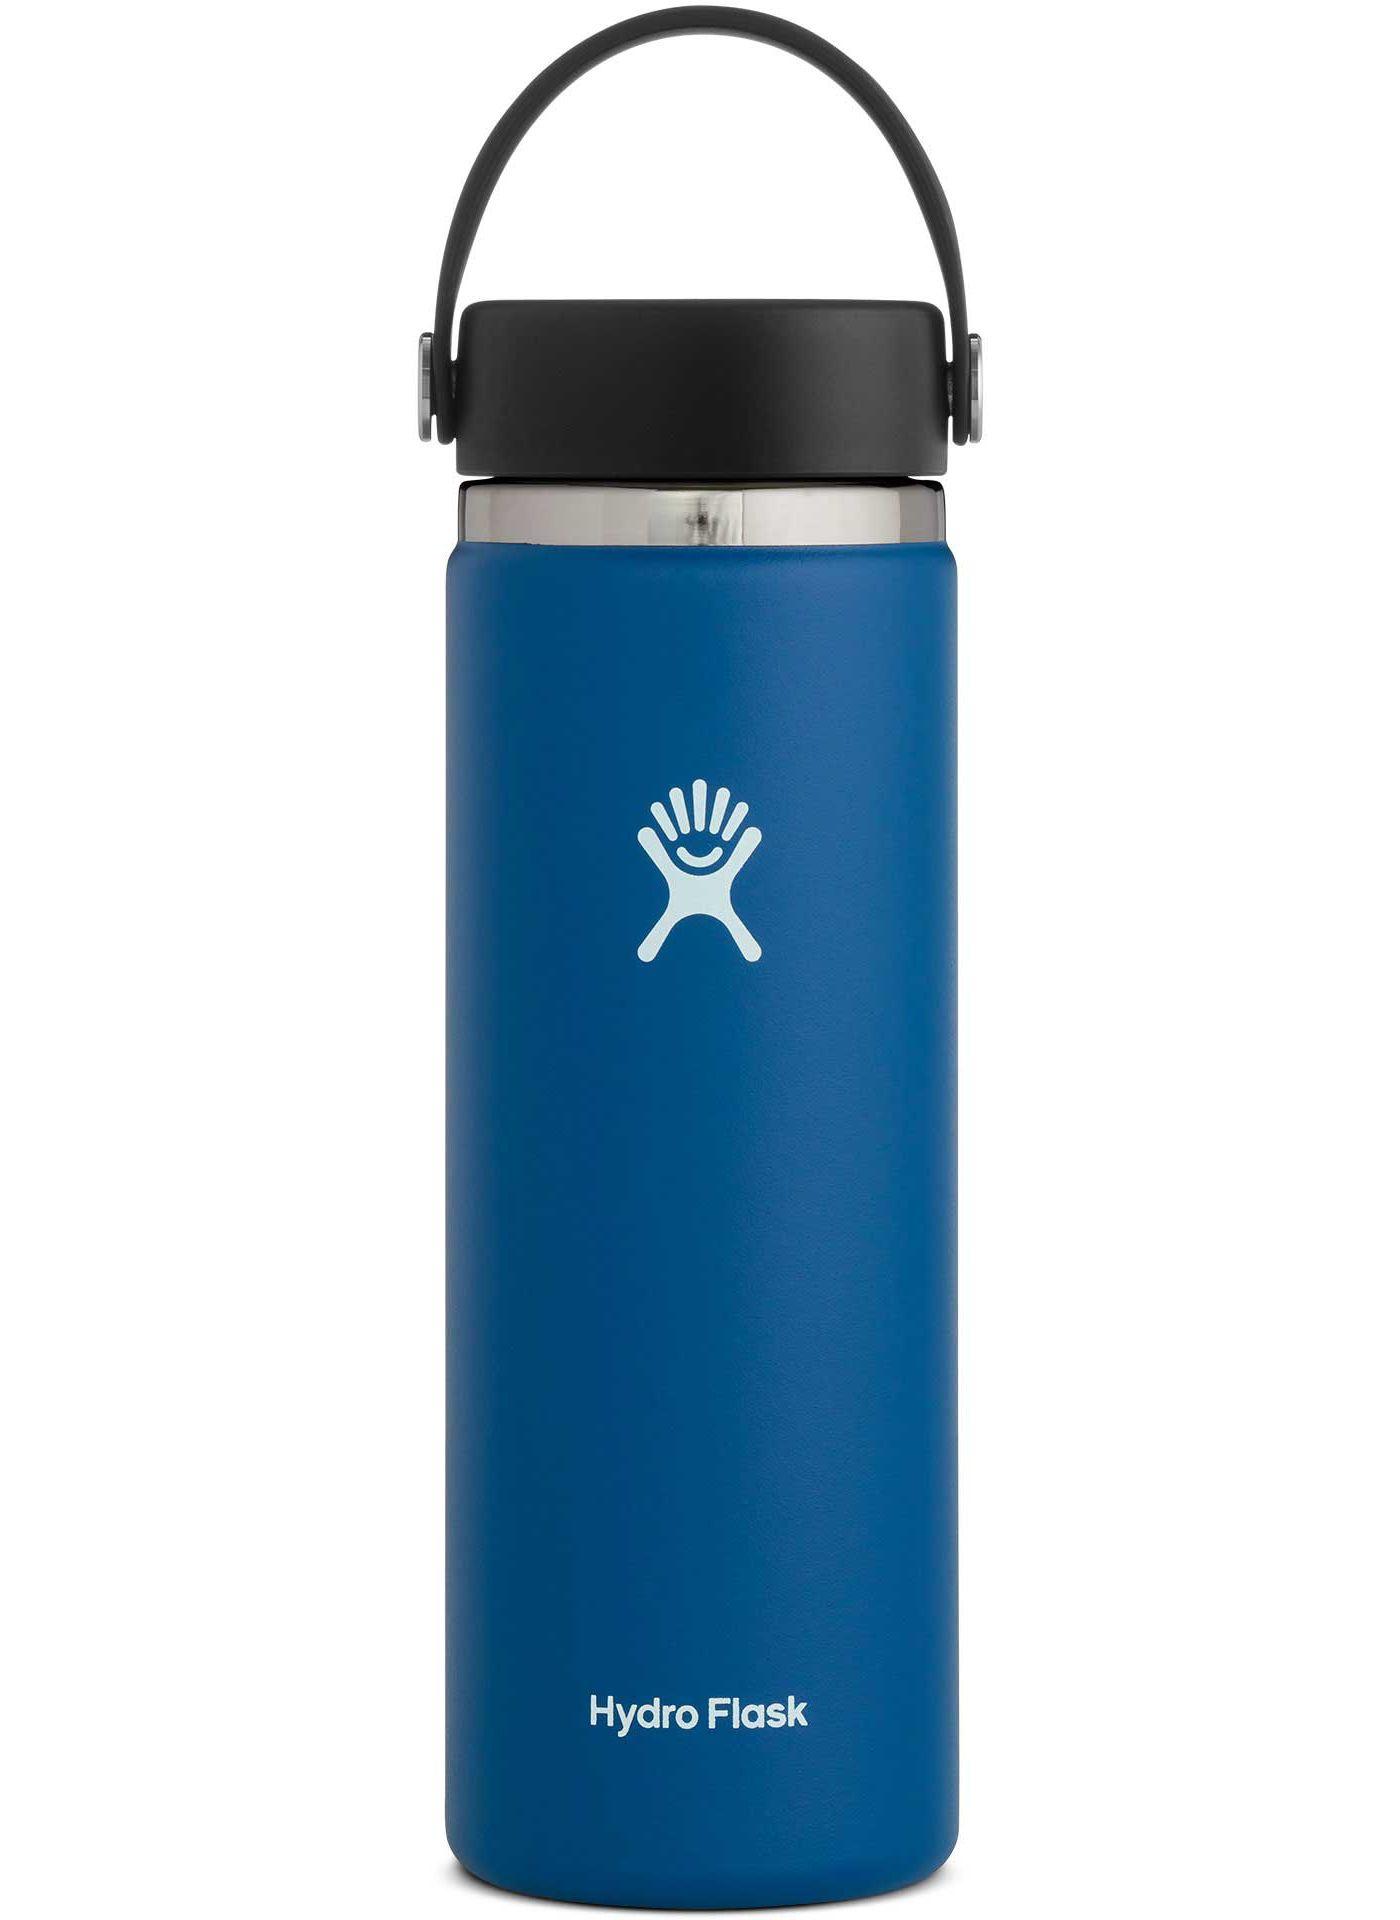 Hydro Flask Wide Mouth 20 oz. Bottle